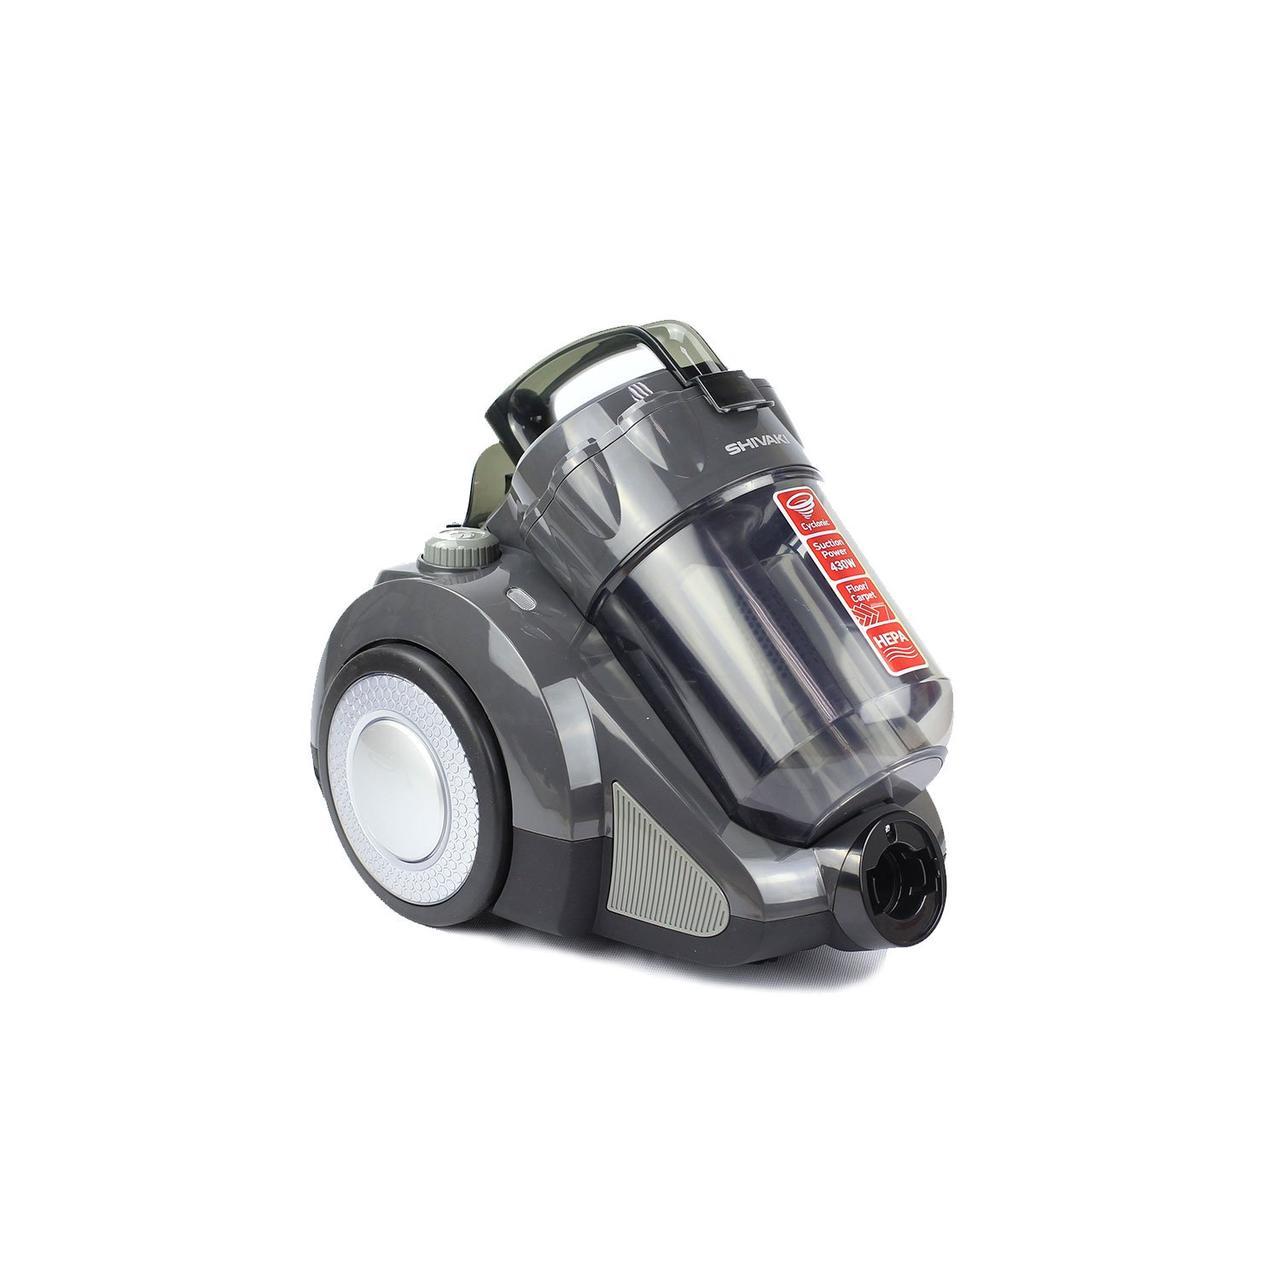 Пылесос Shivaki VCC 0220 серый